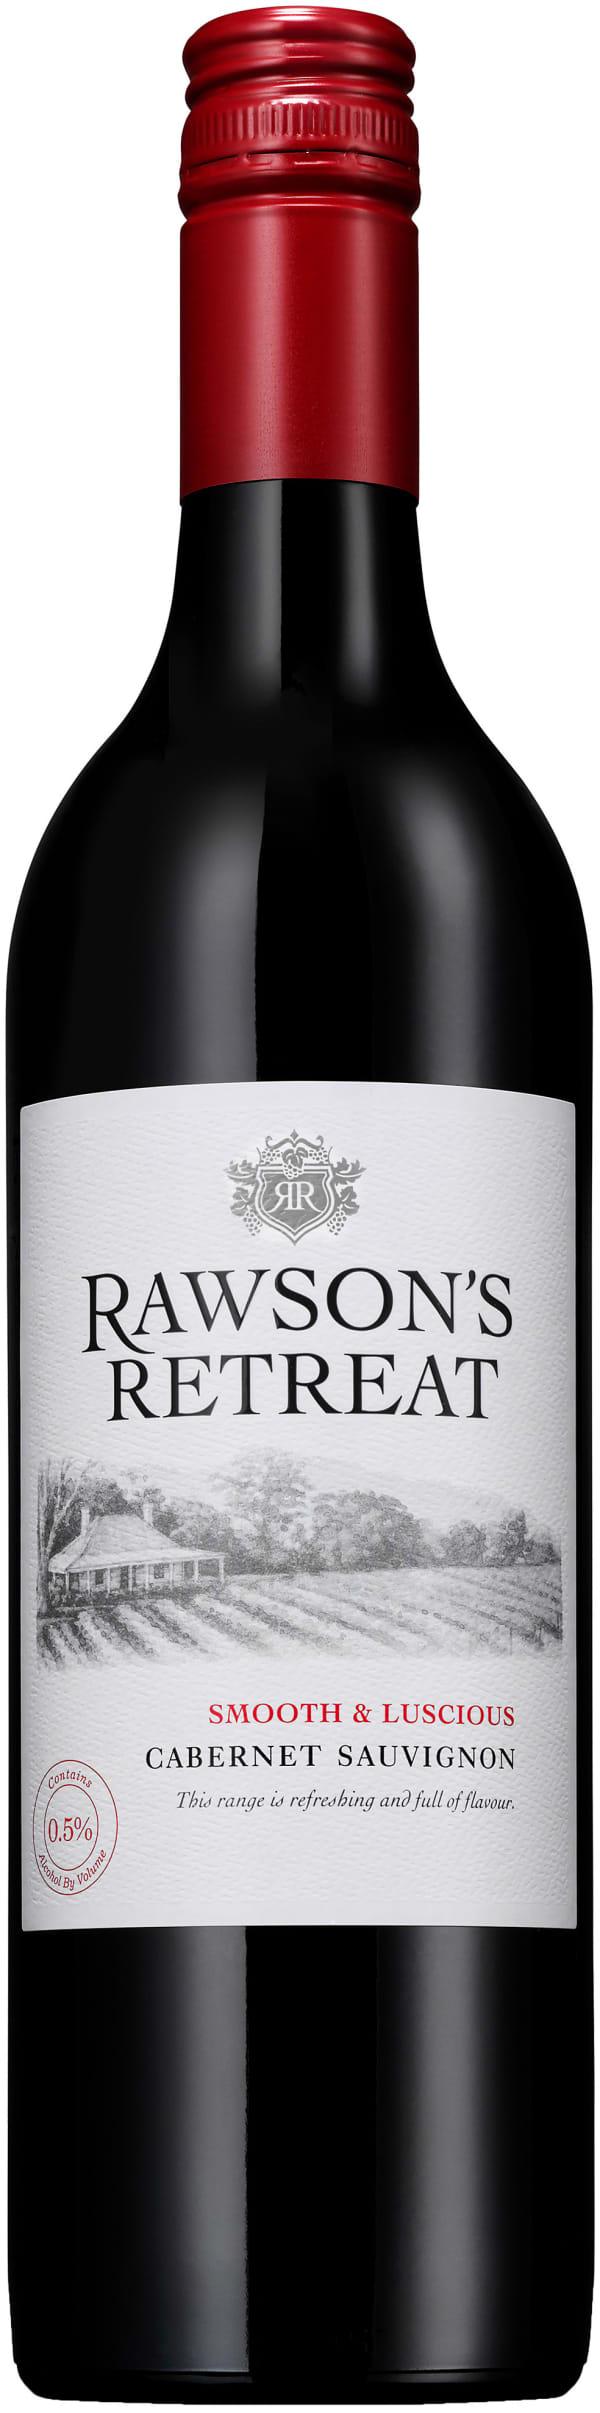 Rawson's Retreat Alcohol Free Cabernet Sauvignon